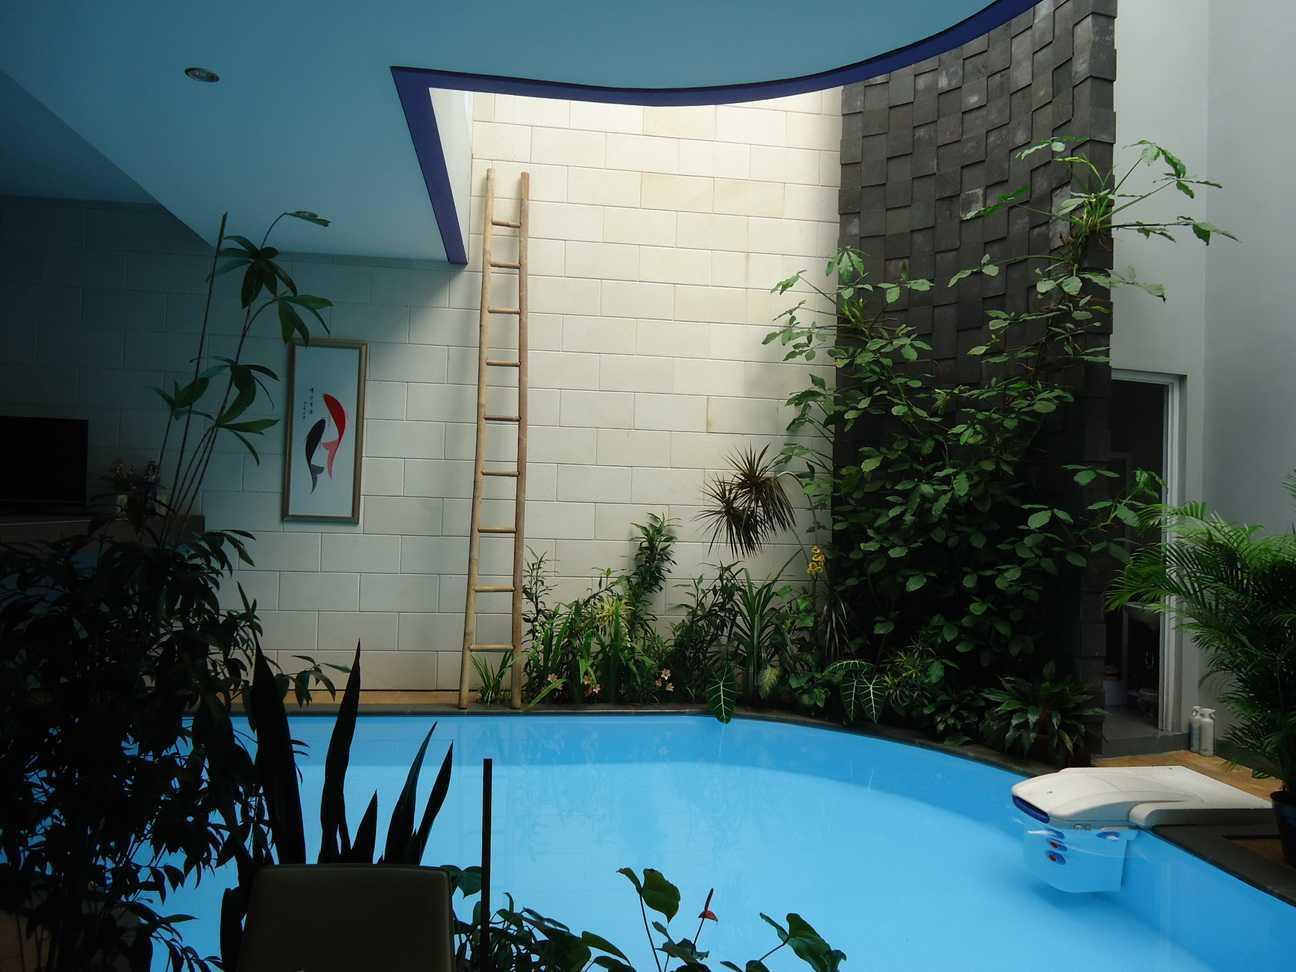 Budi Dharma The Relaxation House Gelong Selatan - Tomang Gelong Selatan - Tomang Gelong-Selatan-11  23860